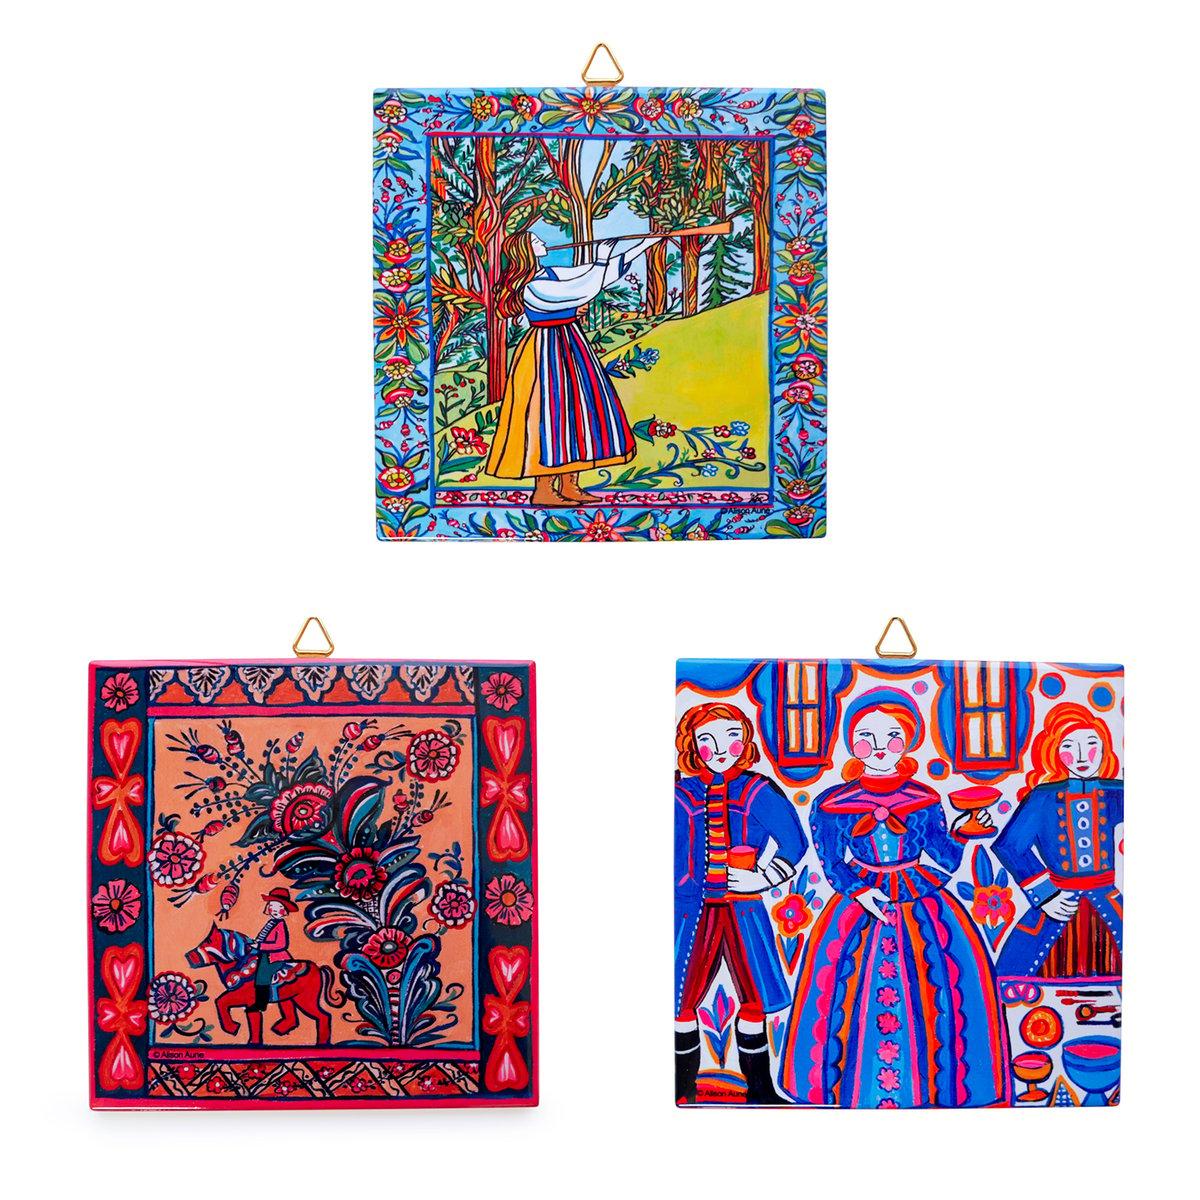 Image of Swedish Ceramic Folk Art Tiles